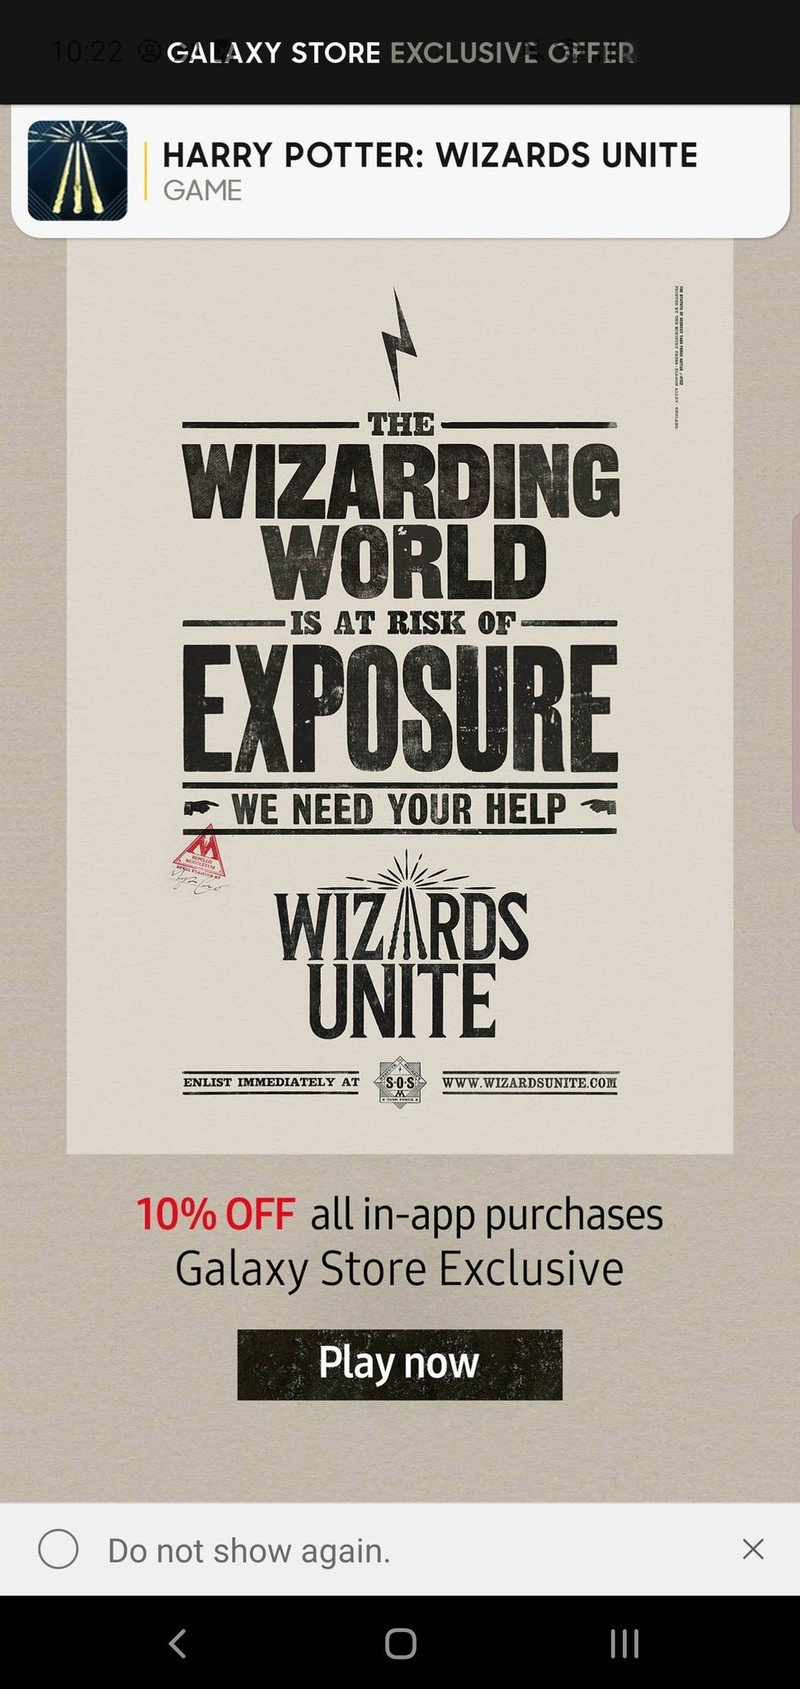 hpwu-galaxy-store-discount.jpg?itok=VMBc